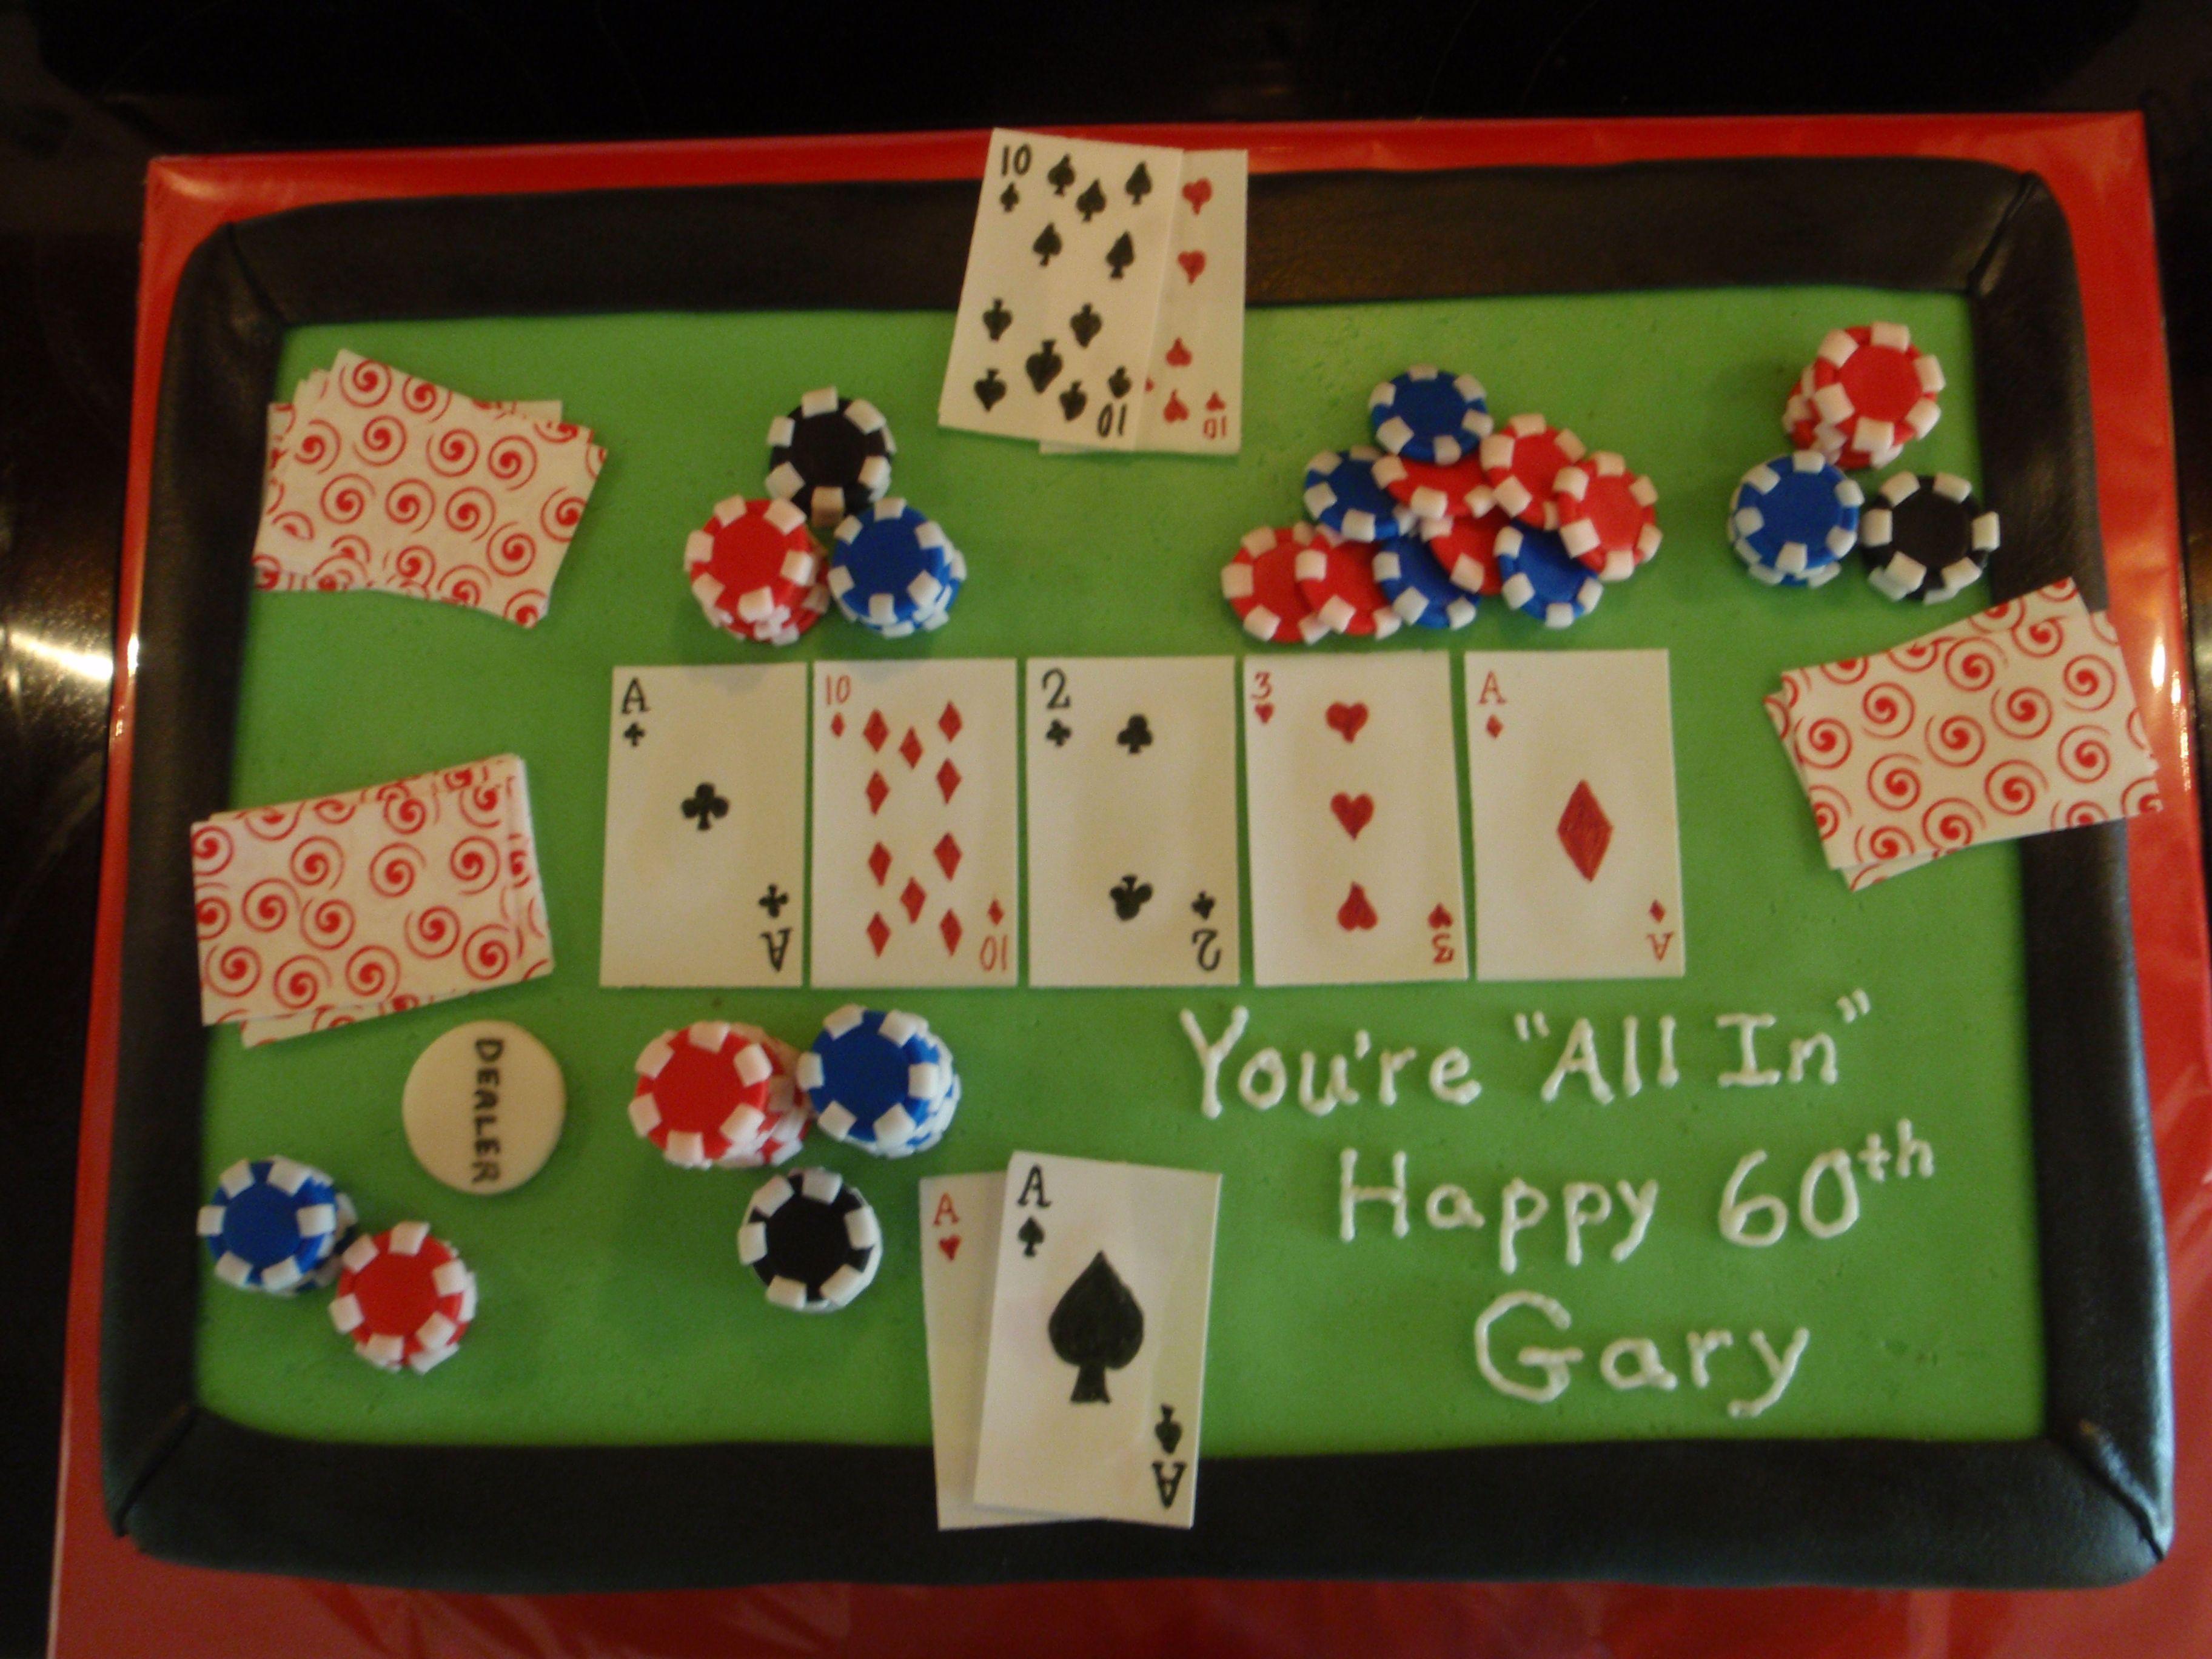 Fun Texas Hold Em poker birthday cake Playing cards were hand